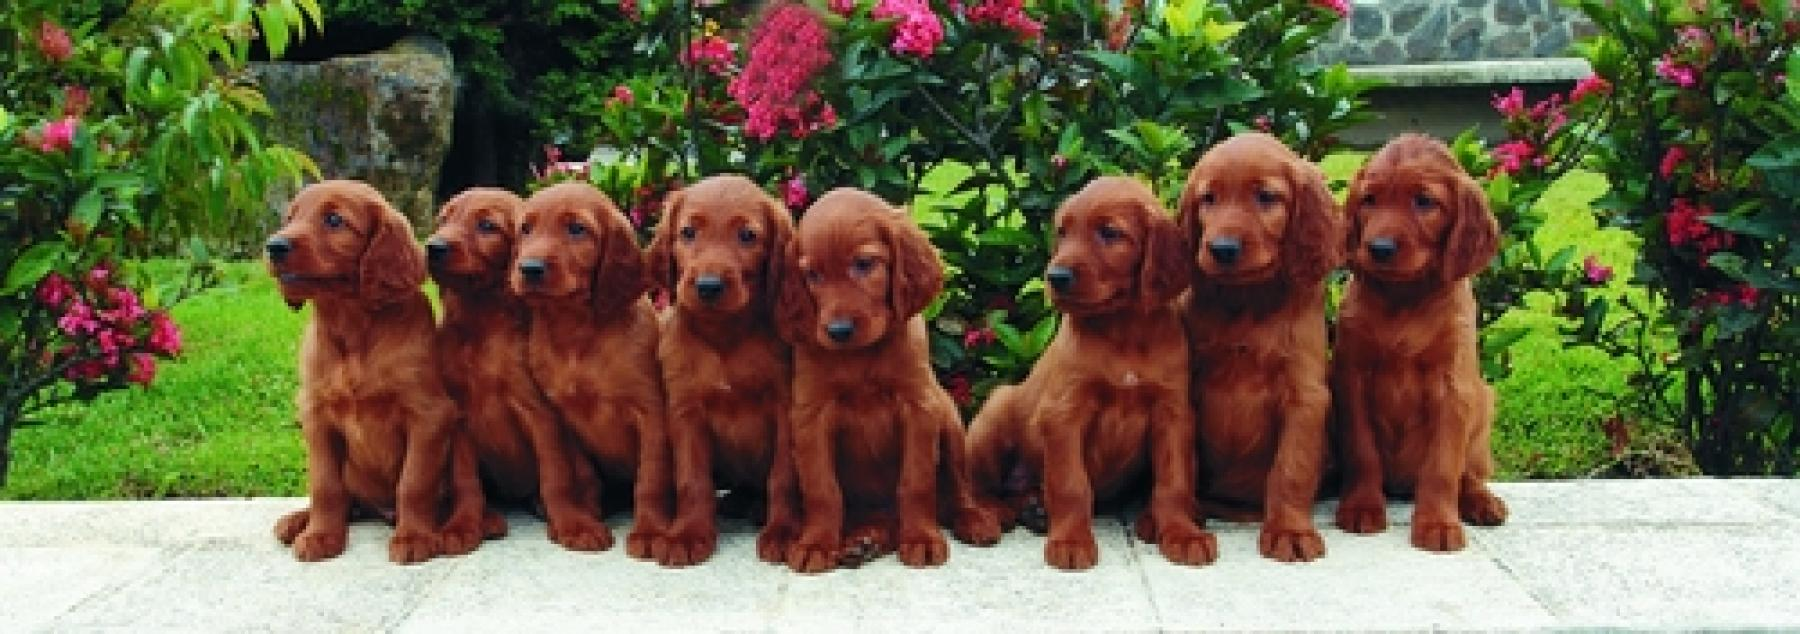 Sterling Find Random Irish Dog Names On Our Dog Name Irish Dog Names Your Lucky Pup Dog Name Generator Buzzfeed Dog Kennel Name Generator bark post Dog Name Generator